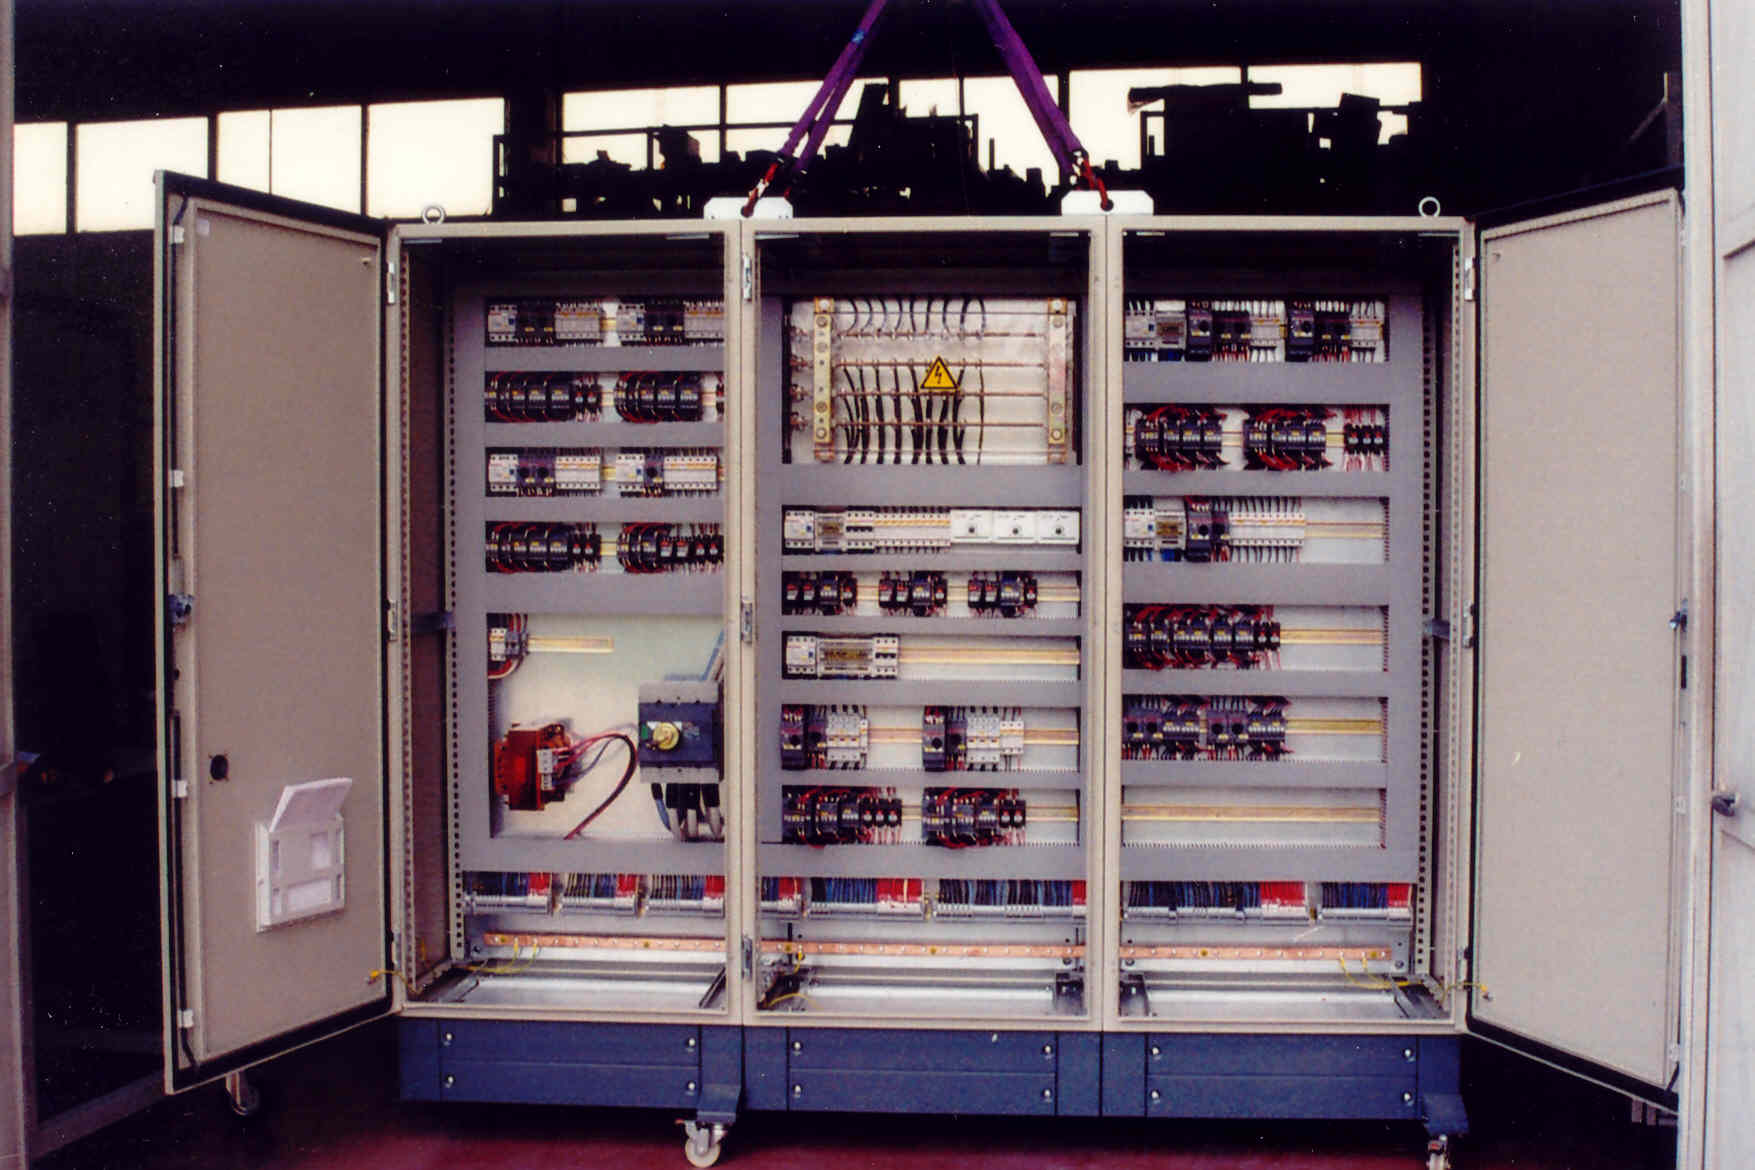 Schemi Elettrici Per Quadri : Quadri elettrici